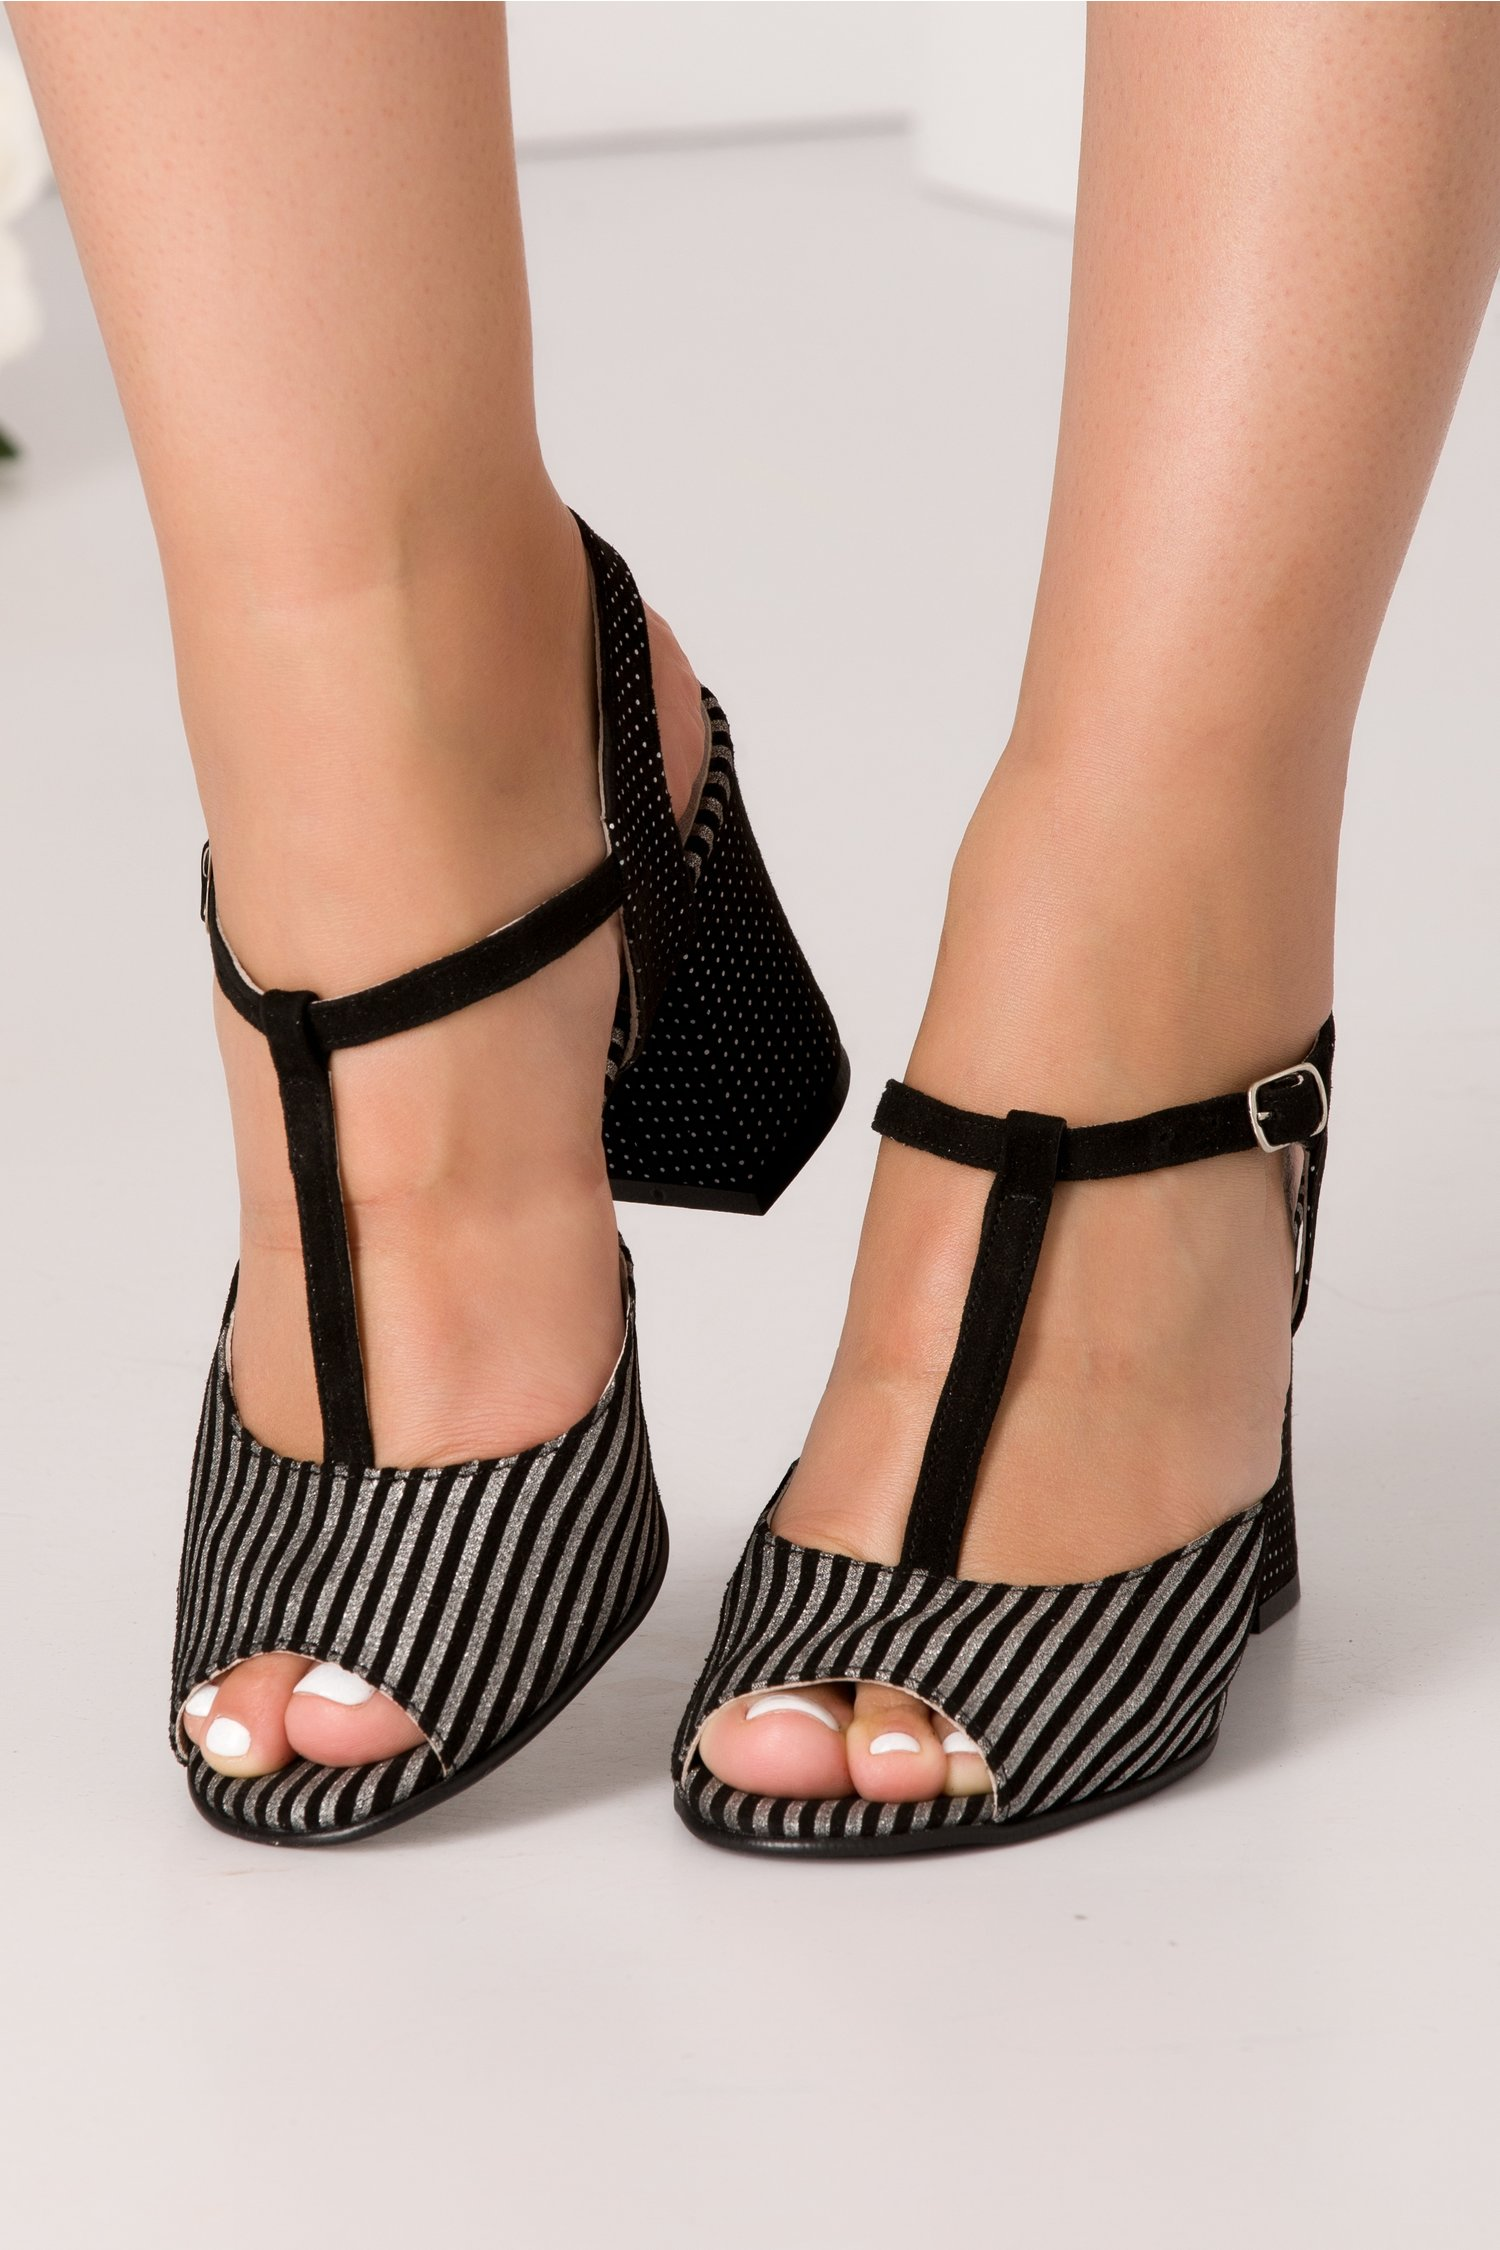 Sandale negre cu dungi argintii si bulinute la spate